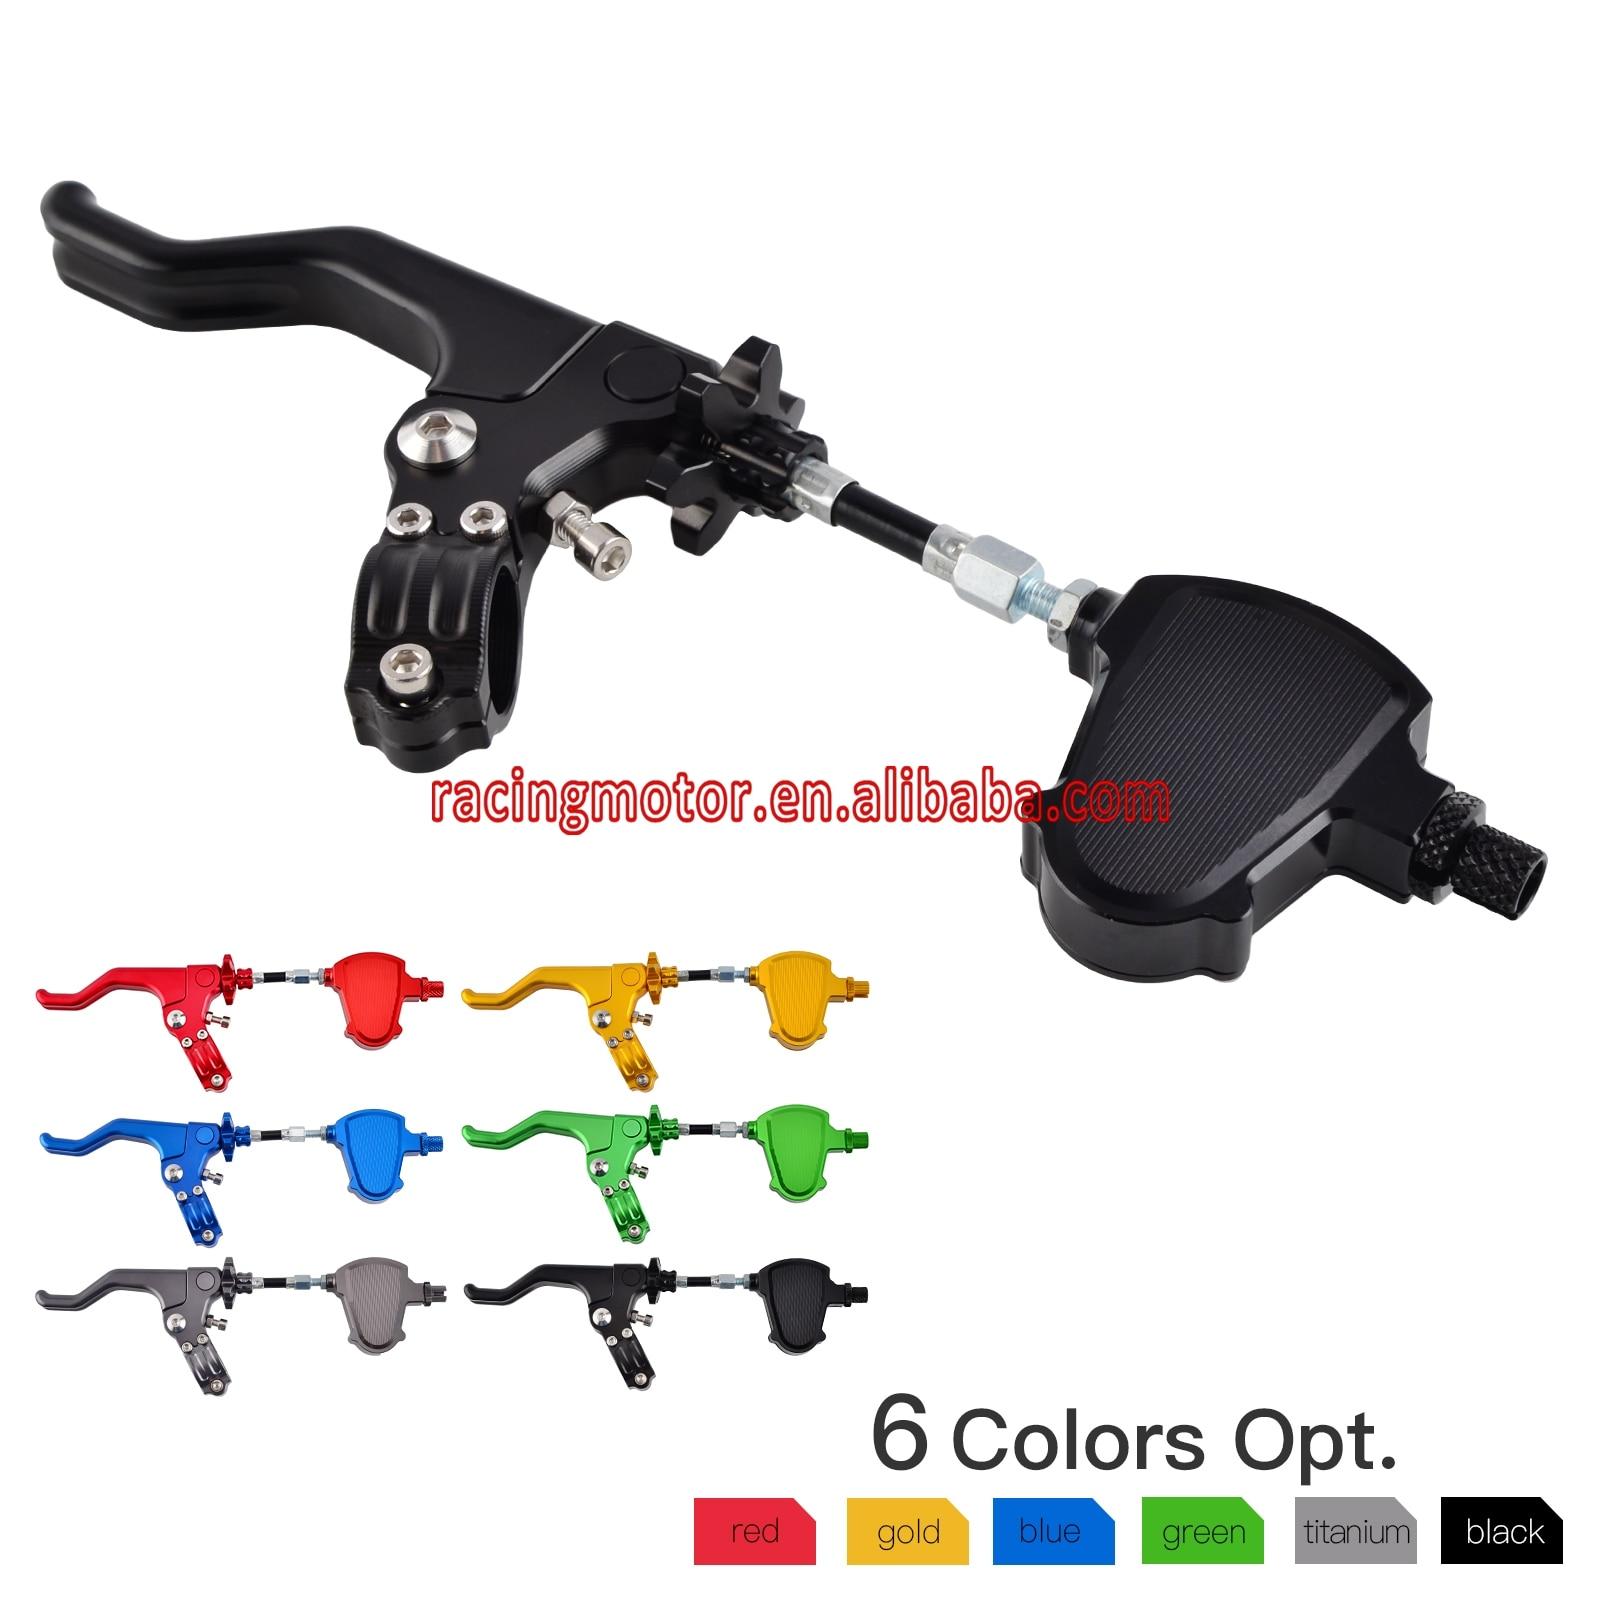 CNC Stunt Clutch Pull Cable Lever Easy System for Yamaha TTR125 TTR250 TTR600 XT250X XTZ125 DT230 Serow 225 250 YZ125X YZ250FX